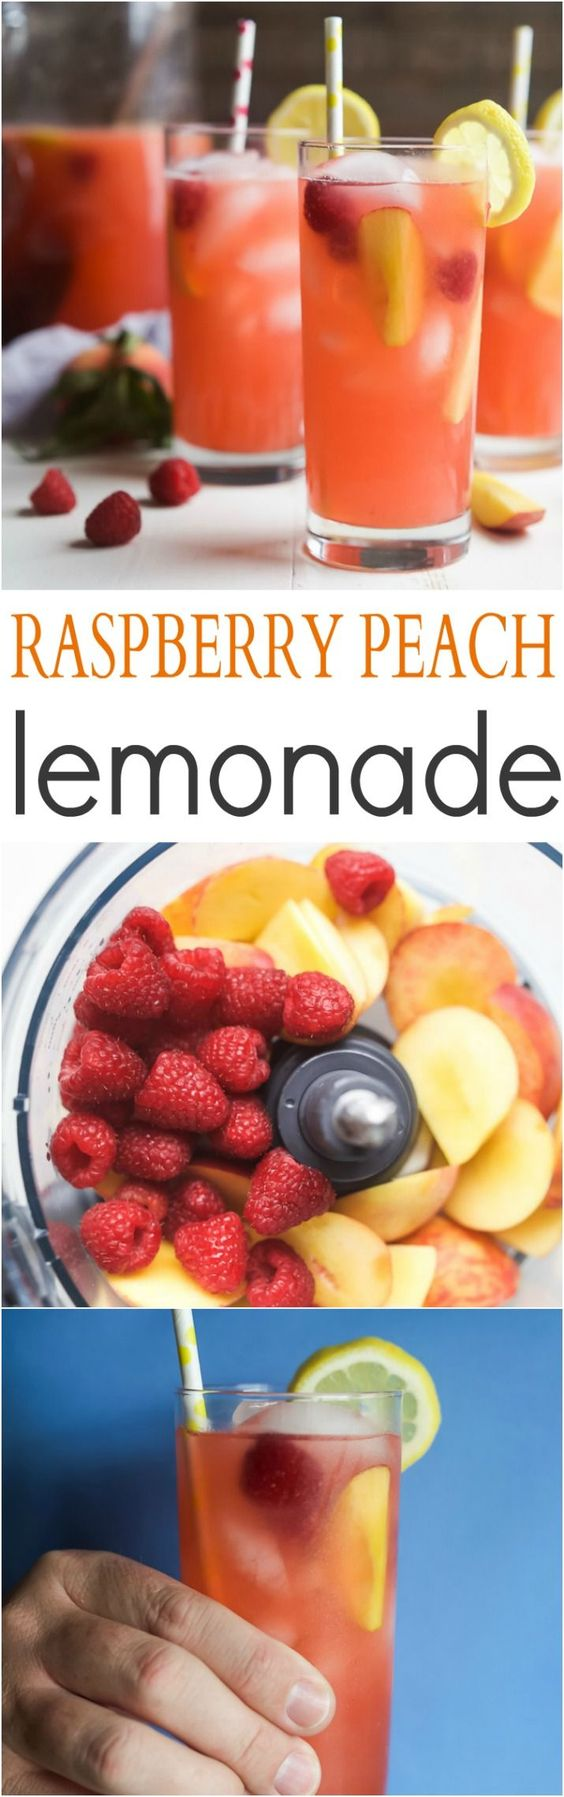 Homemade Raspberry Peach Lemonade Recipe made with fresh raspberries ...